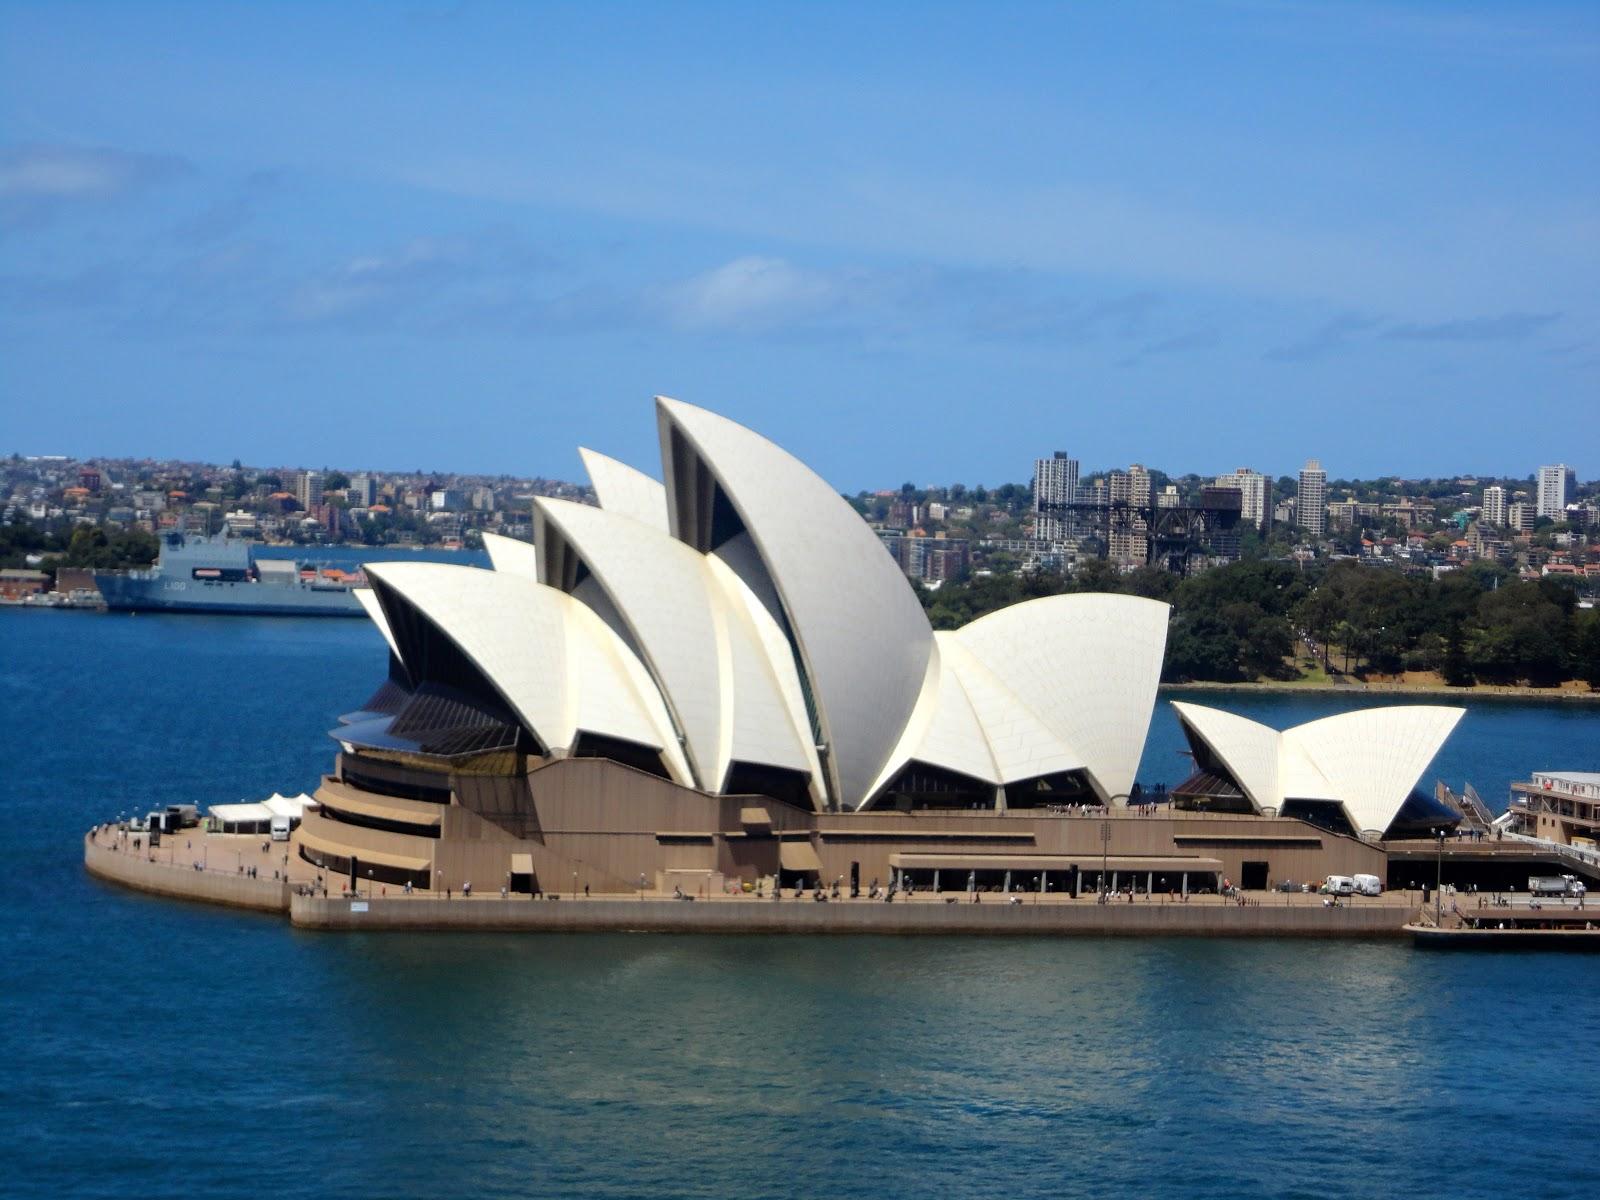 DSC05611 - 35+ Sydney Opera House Bridge Pictures  Background